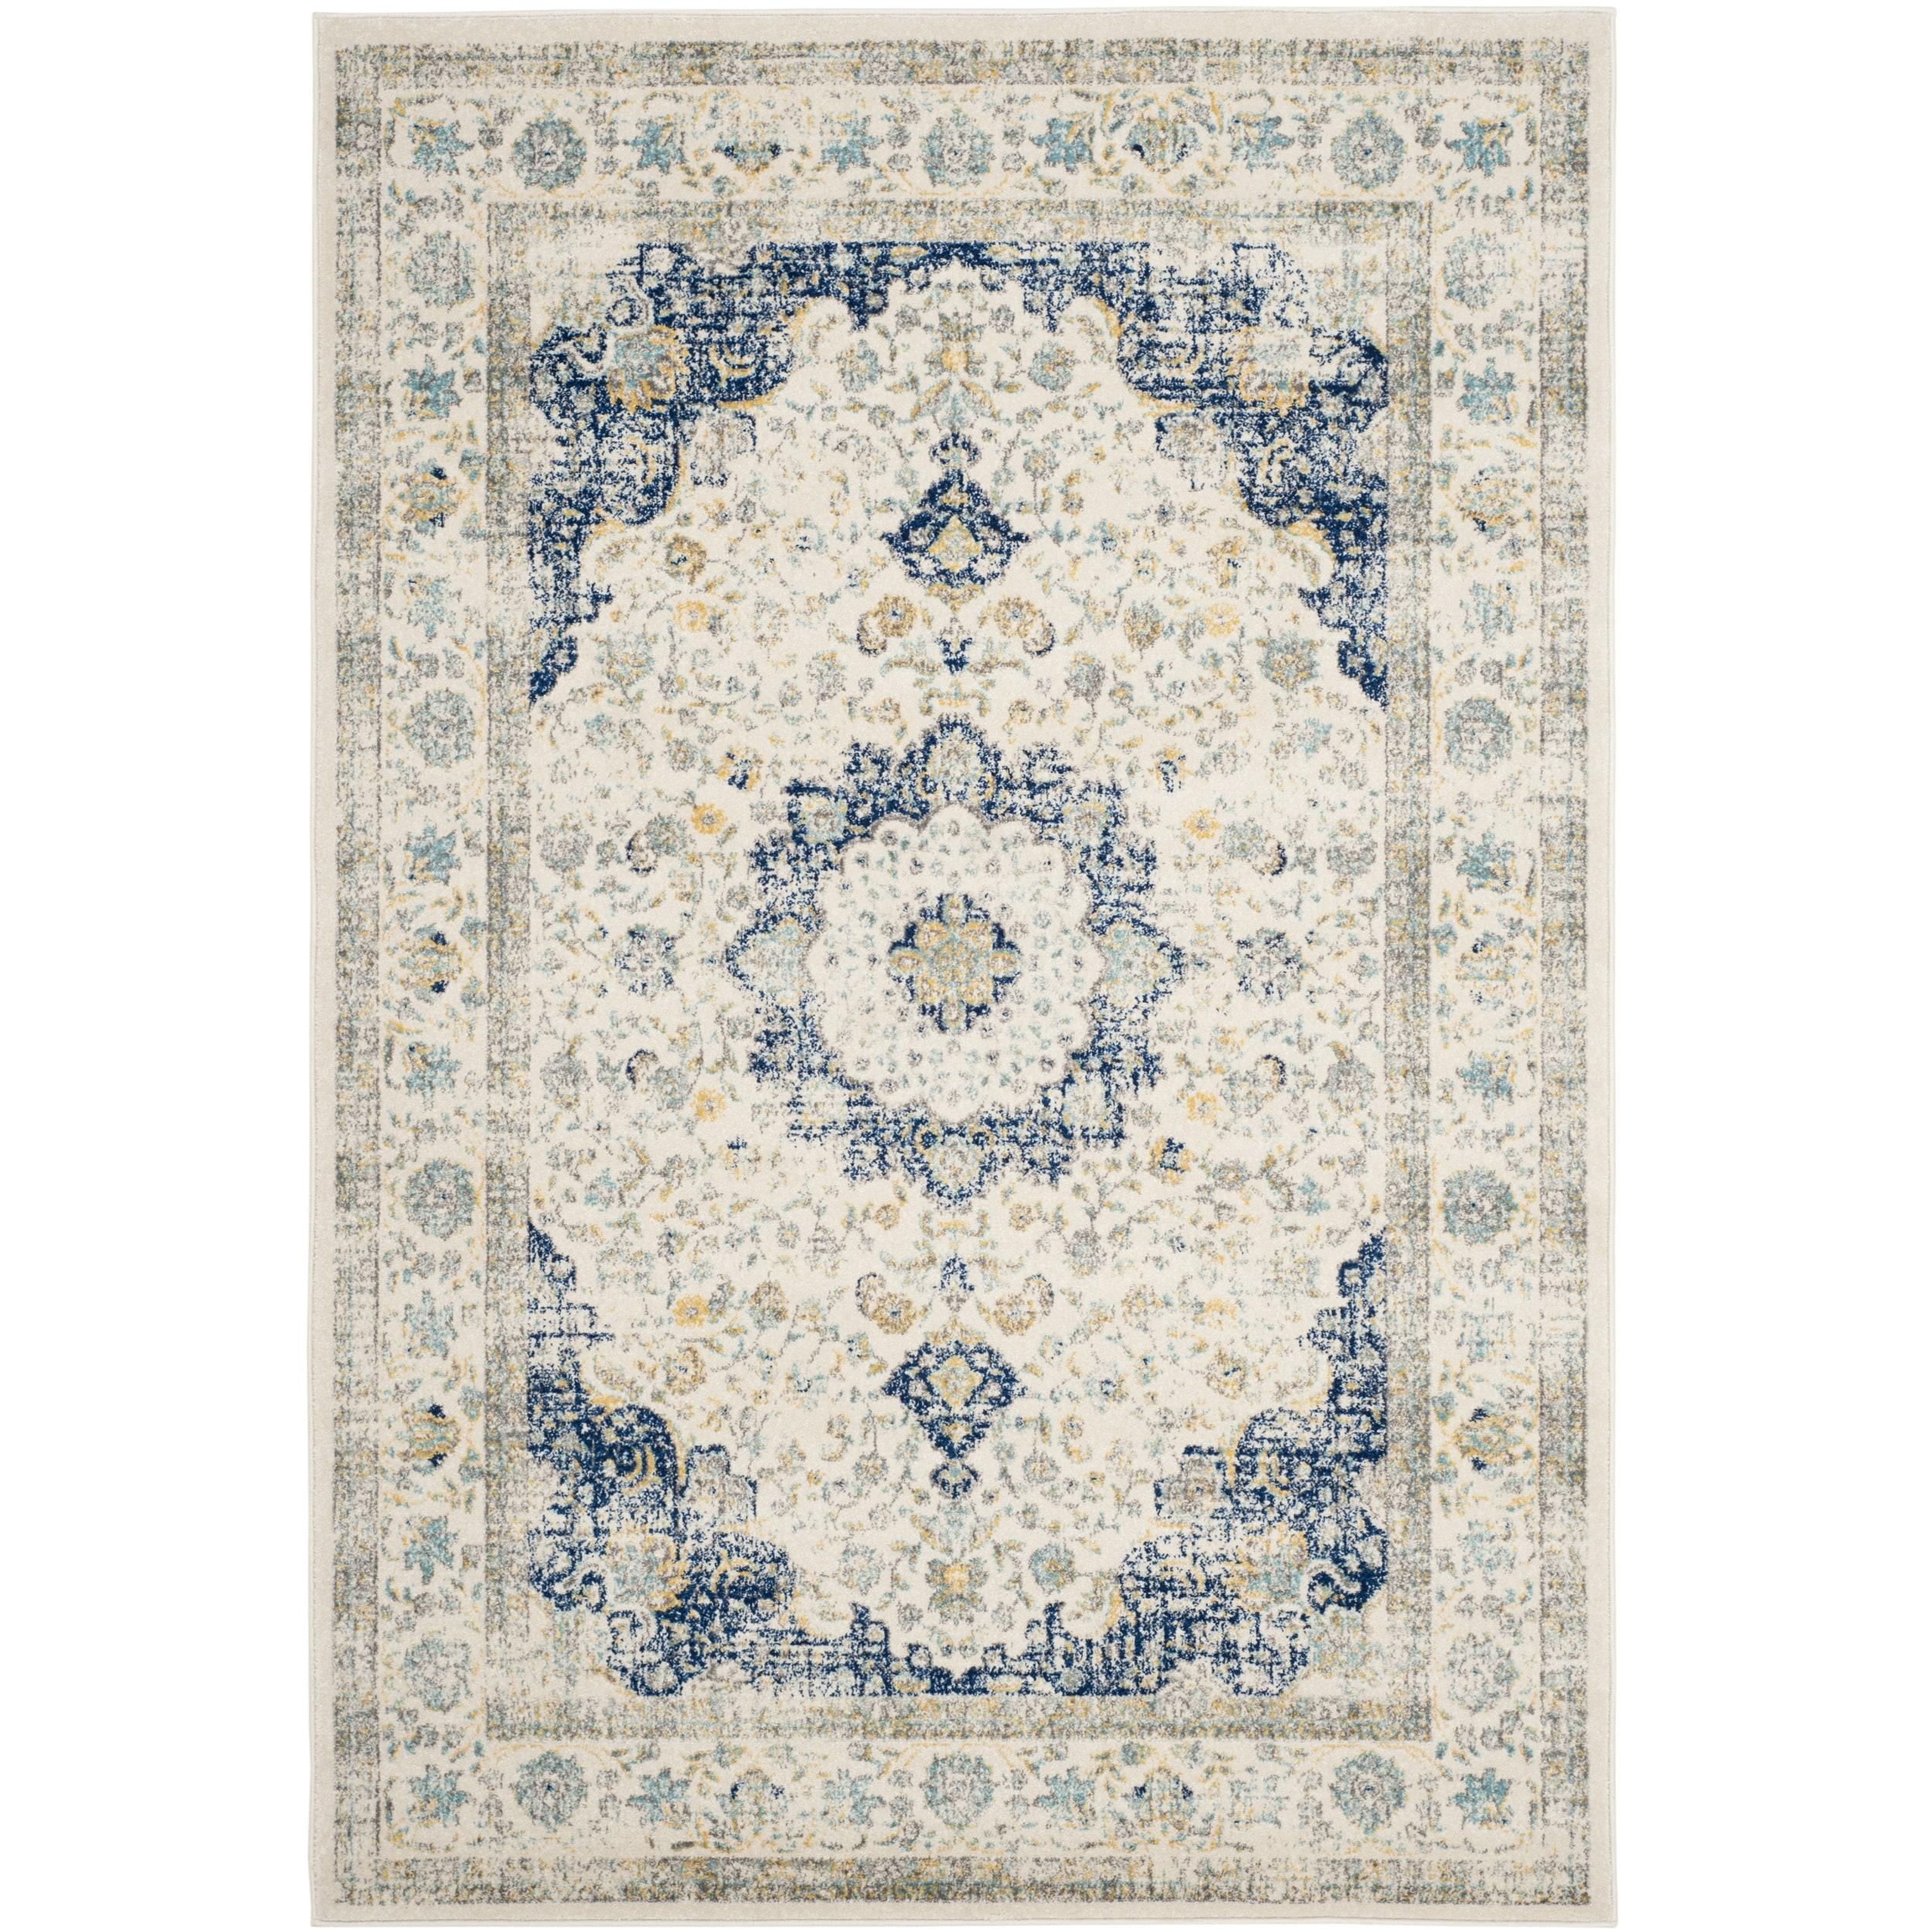 Safavieh Evoke Ivory/ Blue Rug (9' x 12')